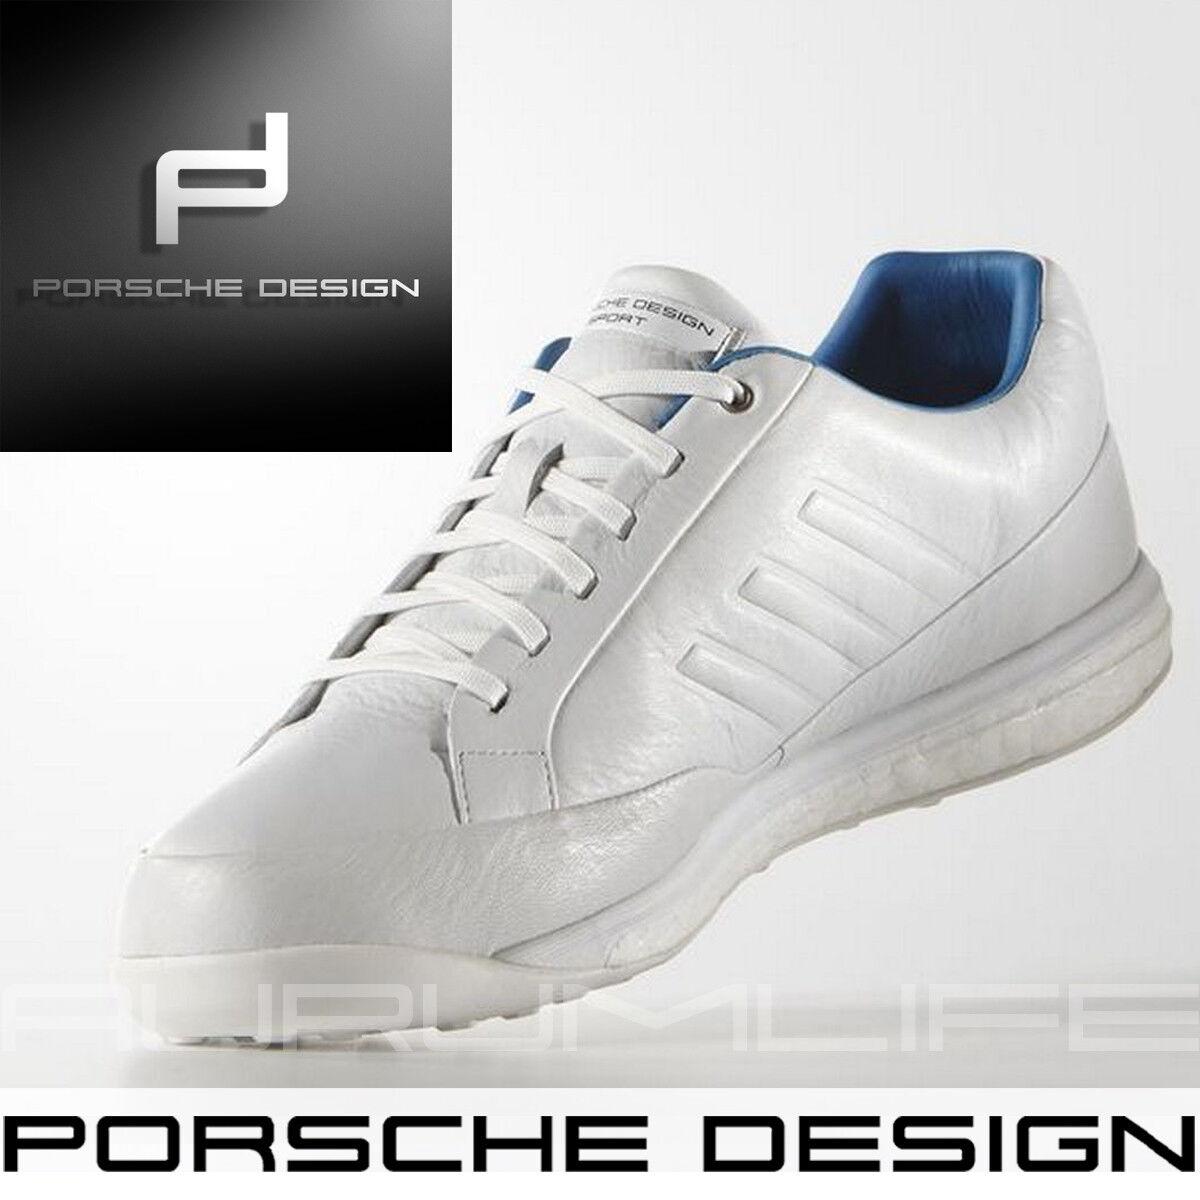 Adidas Porsche Design Mens schuhe Sport Driving Leather Boost Bounce Mens AF4409